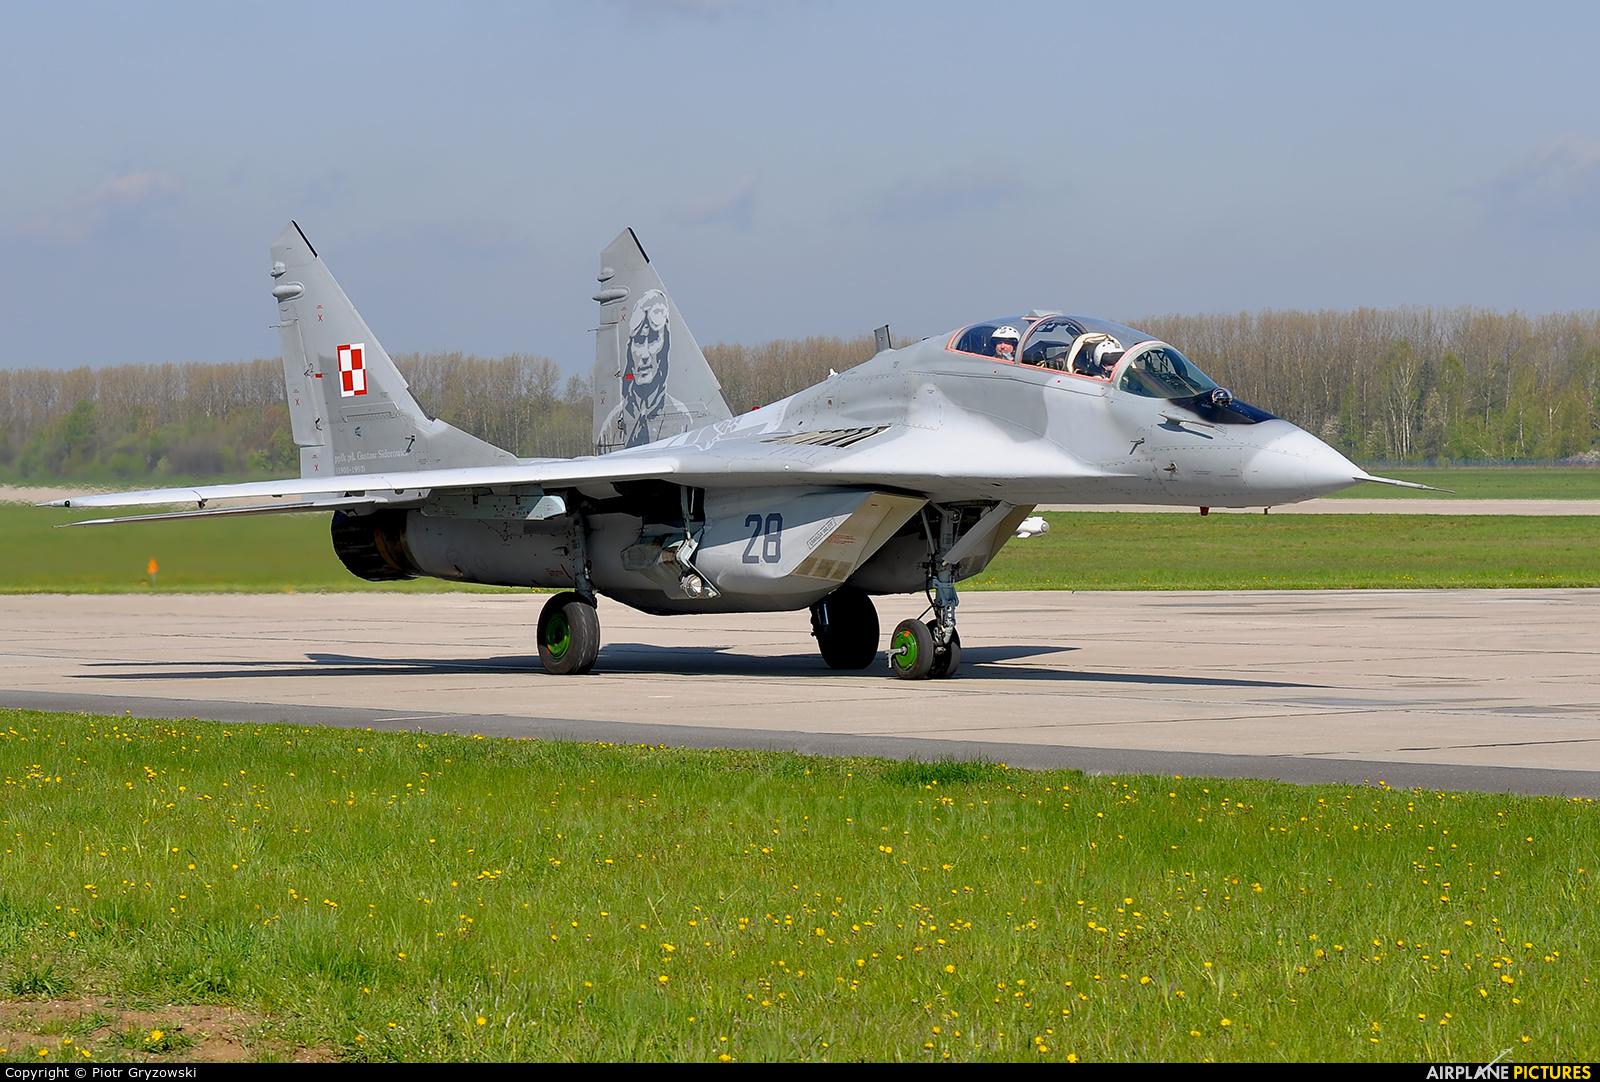 Poland - Air Force 28 aircraft at Mińsk Mazowiecki